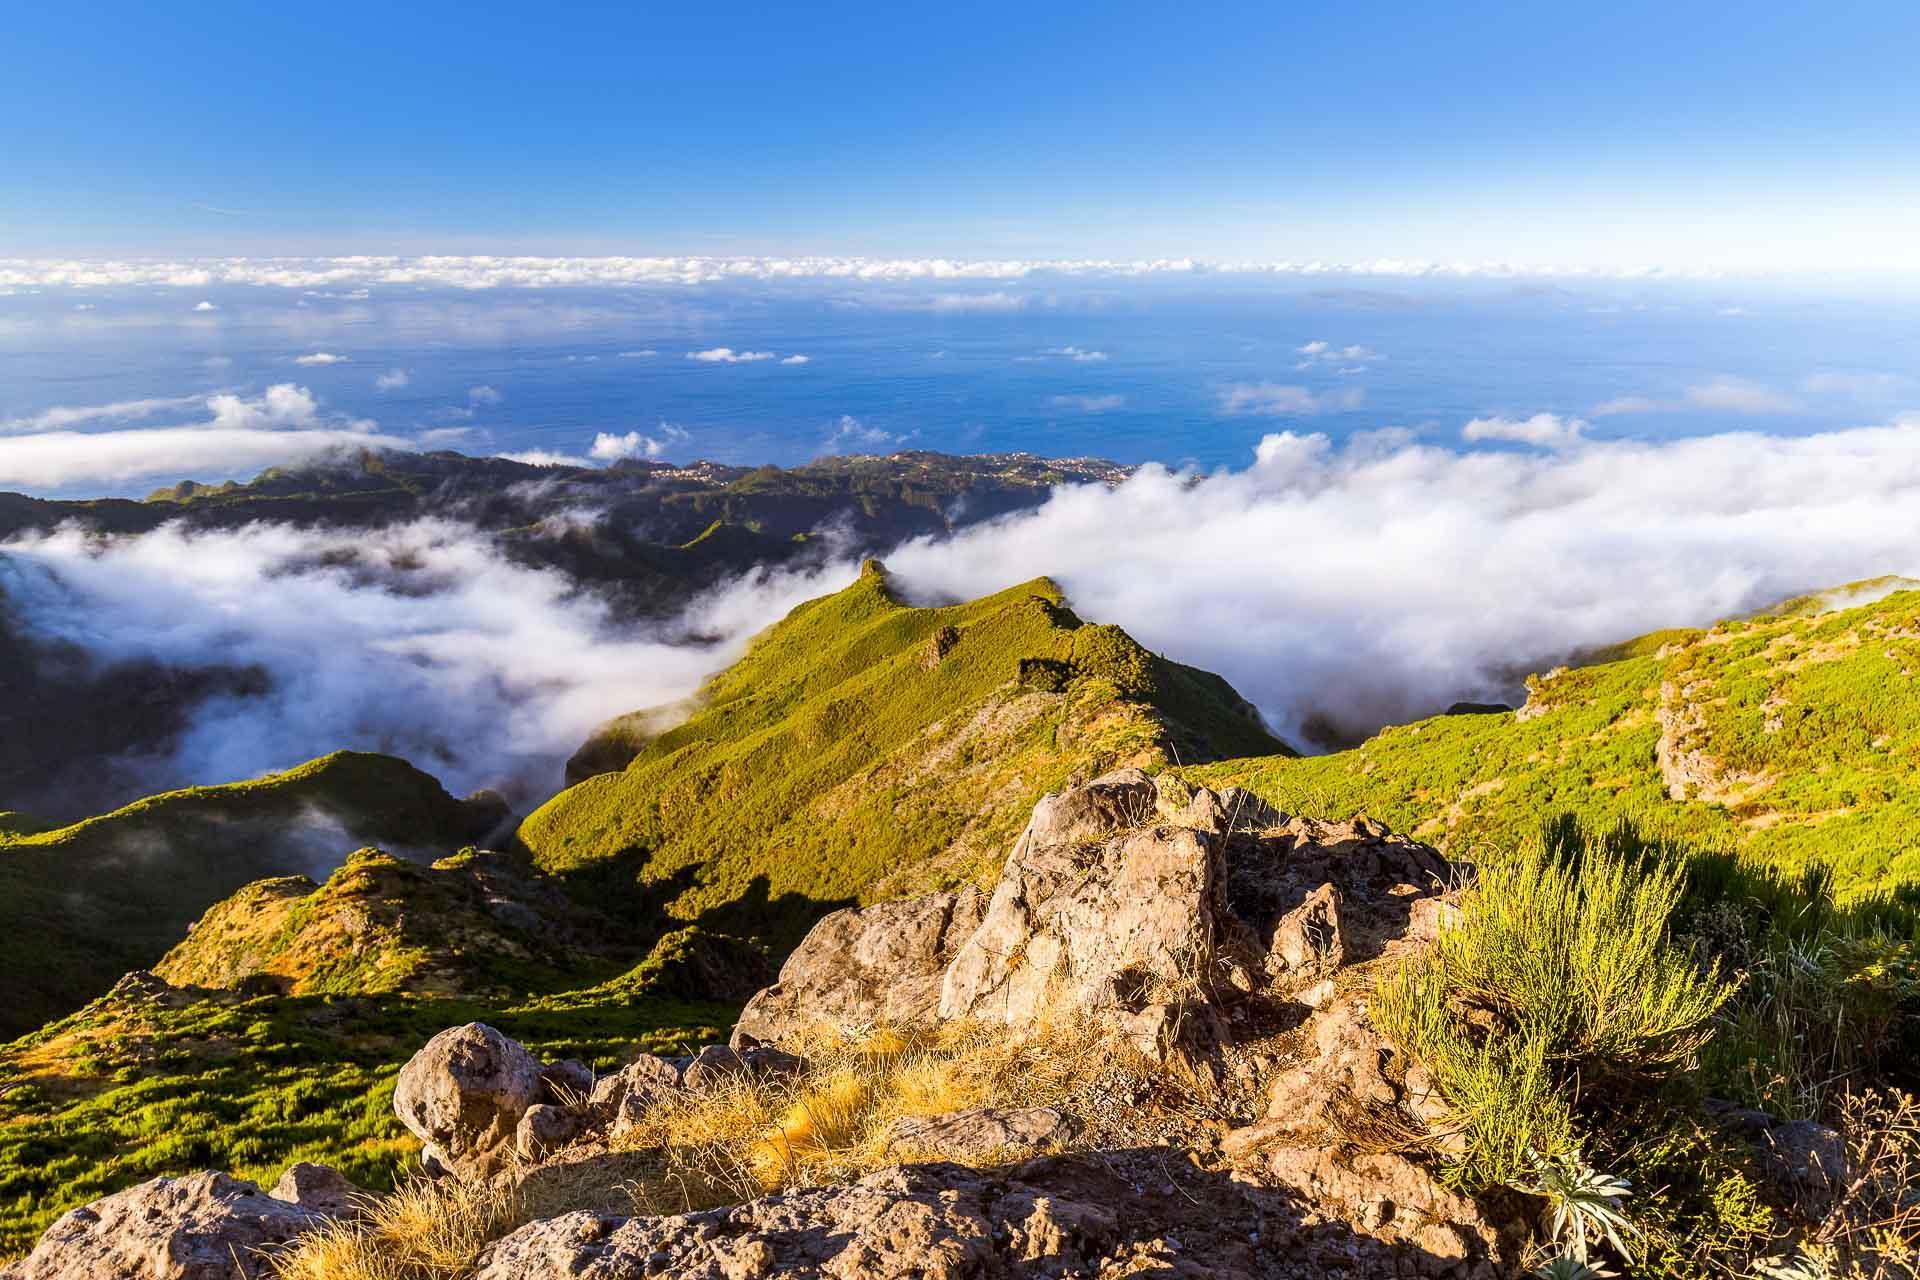 Le Pico Ruivo et le Pico Arierio en randonnée. © Nikolai Sorokin